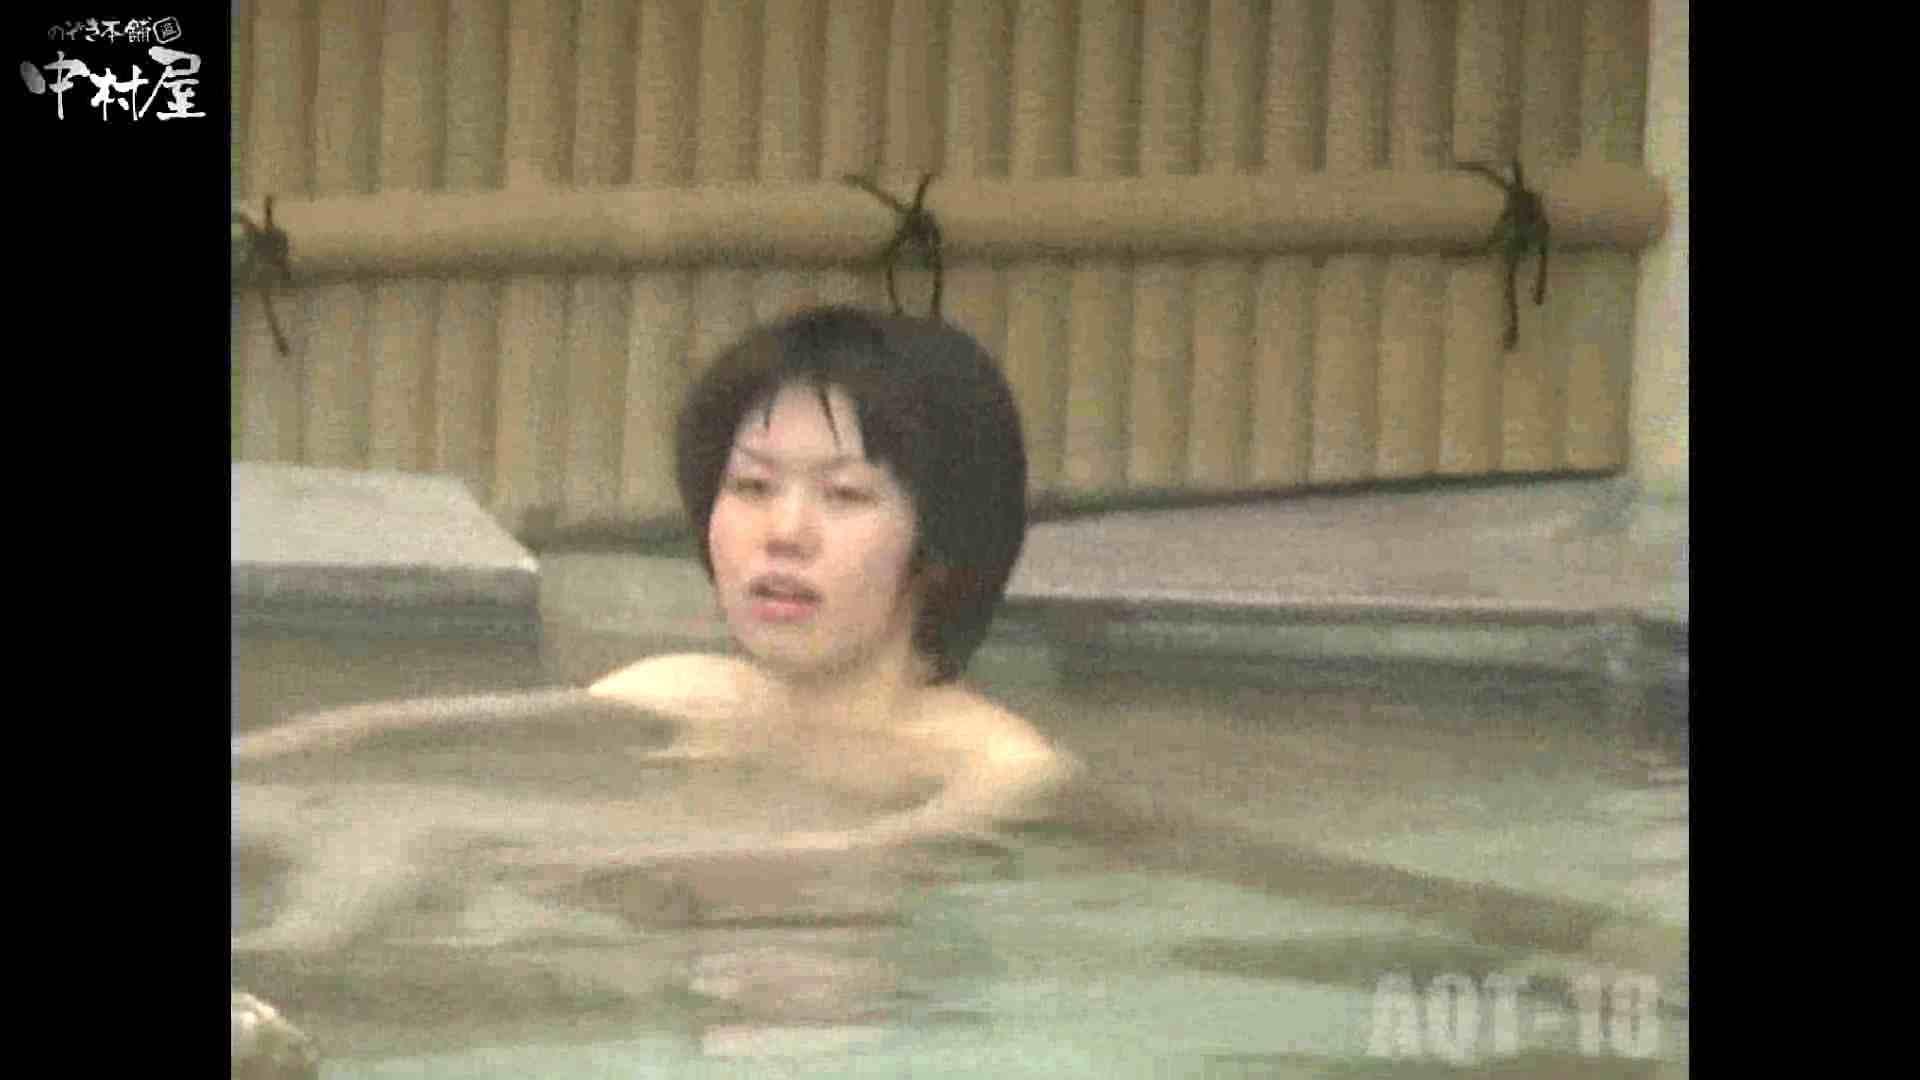 Aquaな露天風呂Vol.882潜入盗撮露天風呂十八判湯 其の七 潜入   OLセックス  84画像 5